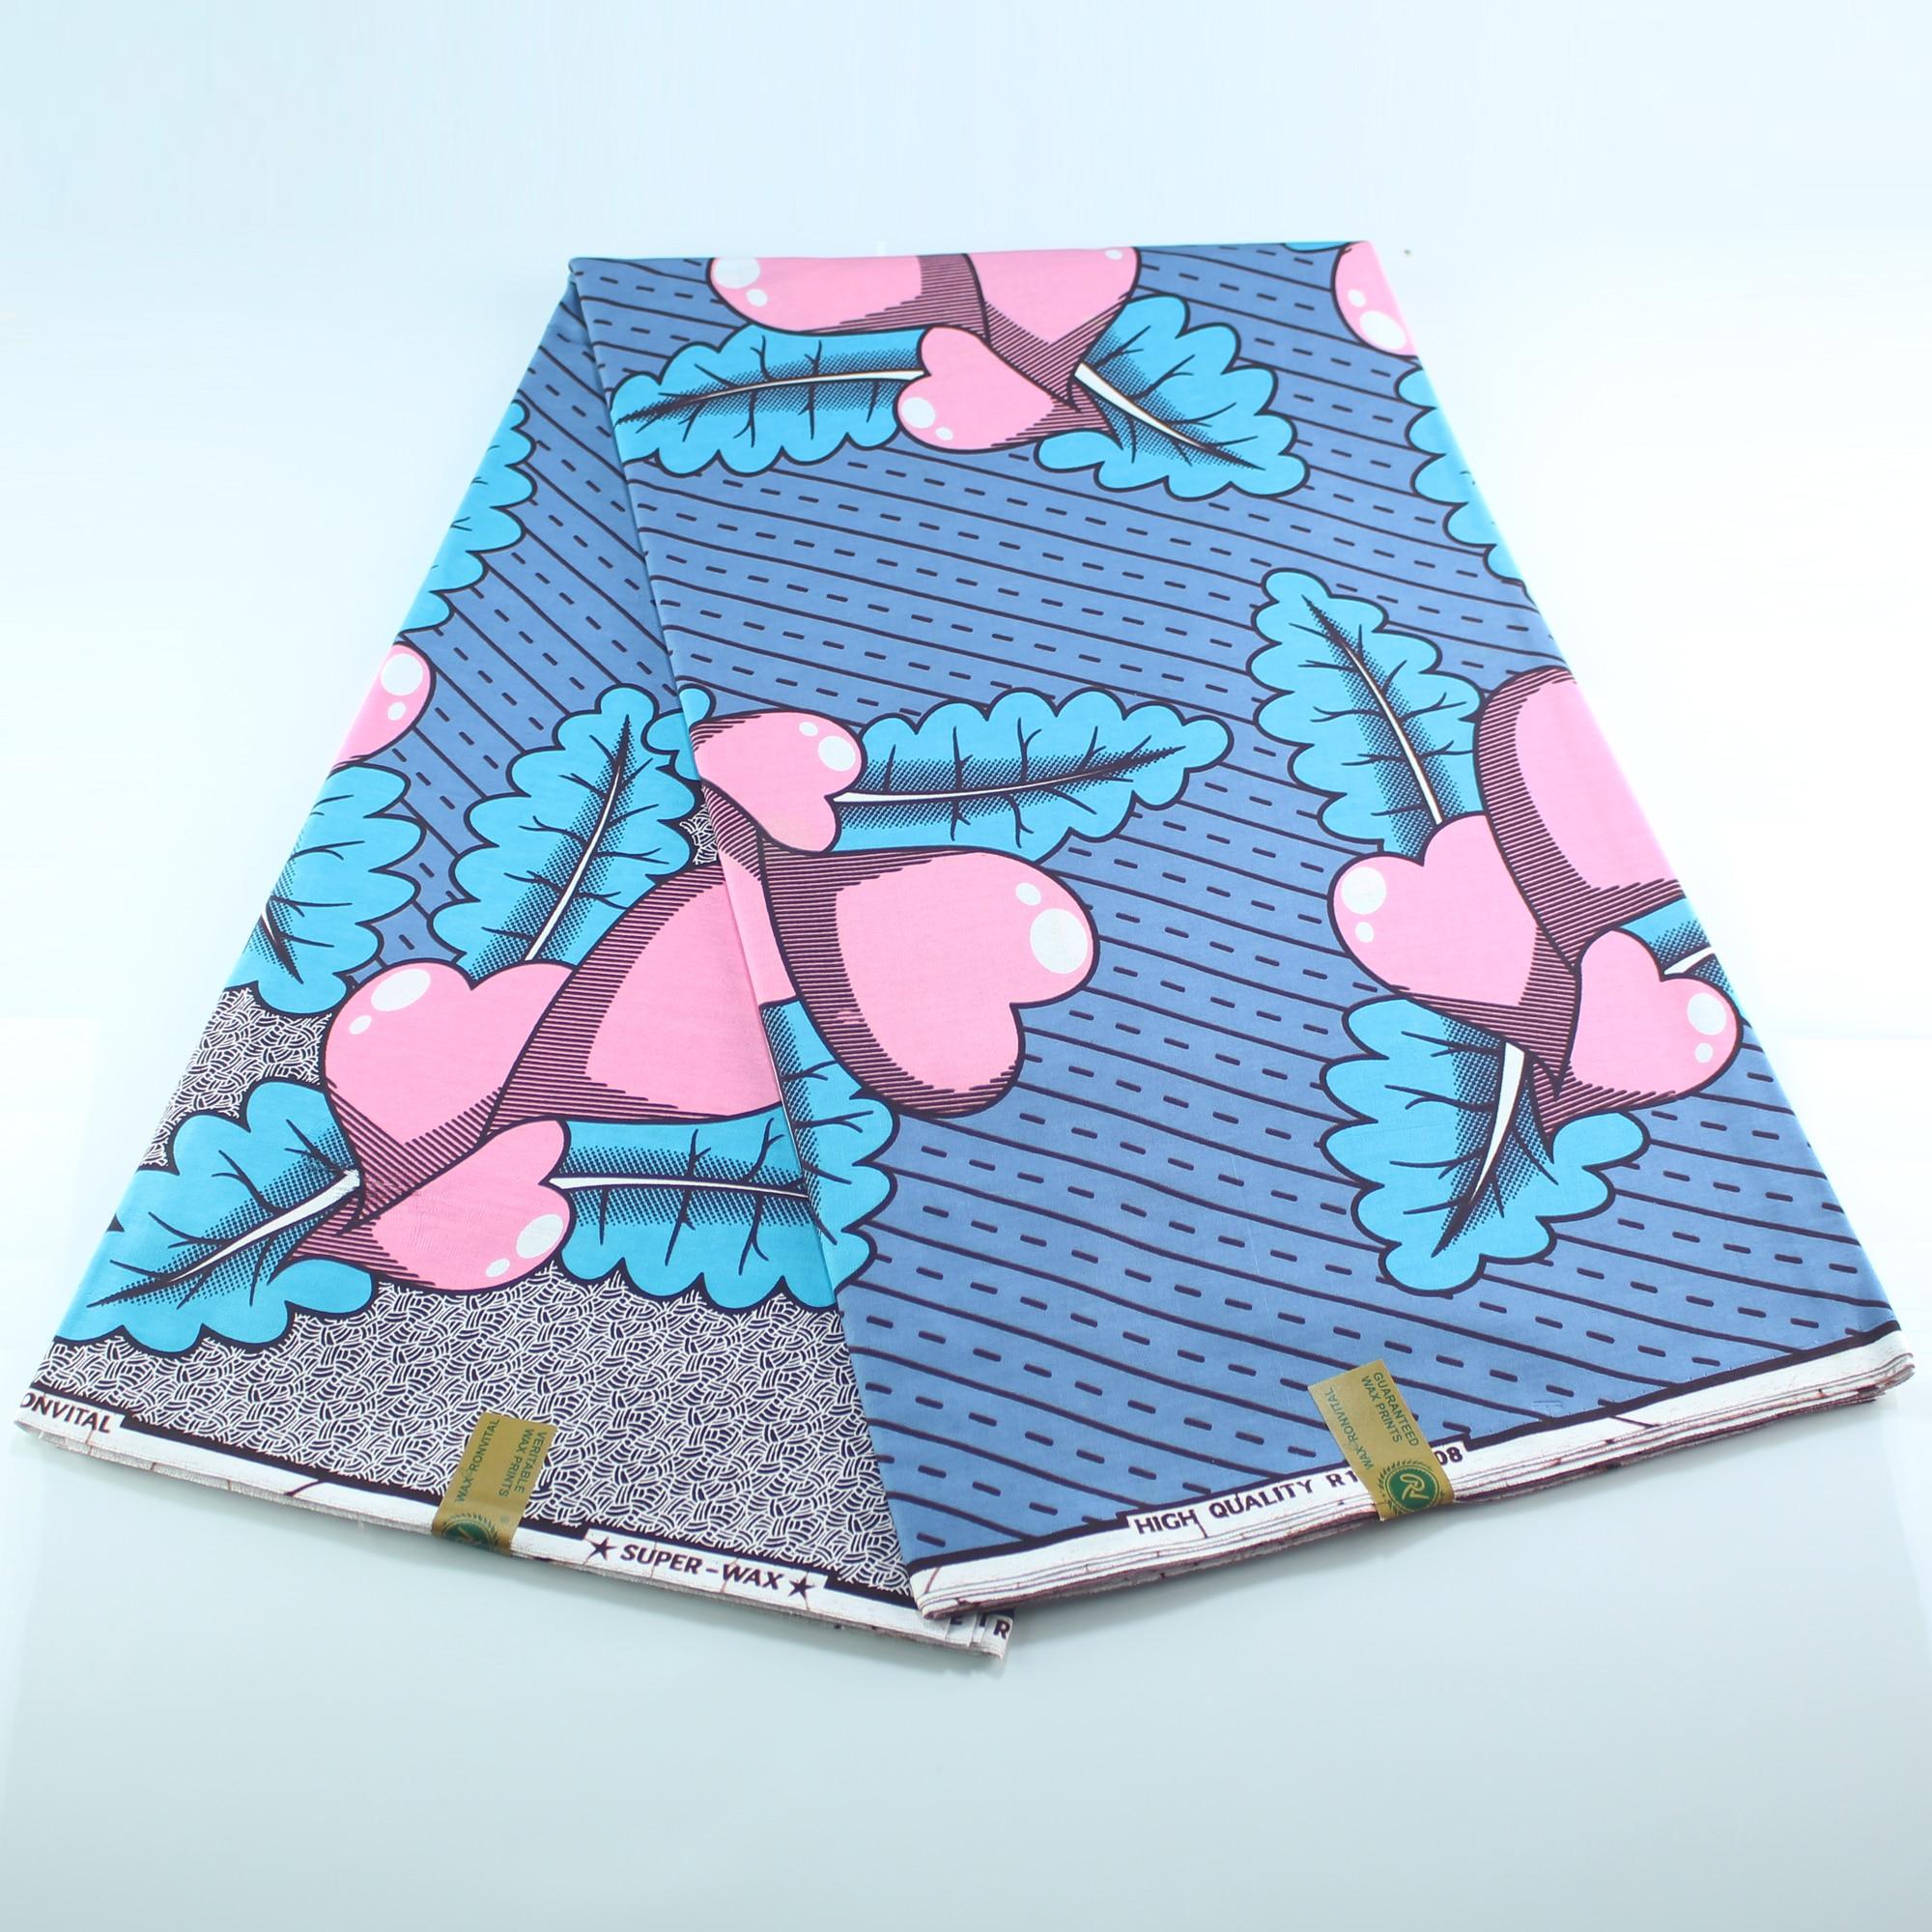 Guaranteed Real Dutch Wax High Quality Pagne Dutch Wax 6yards African Ankara Sewing Fabric